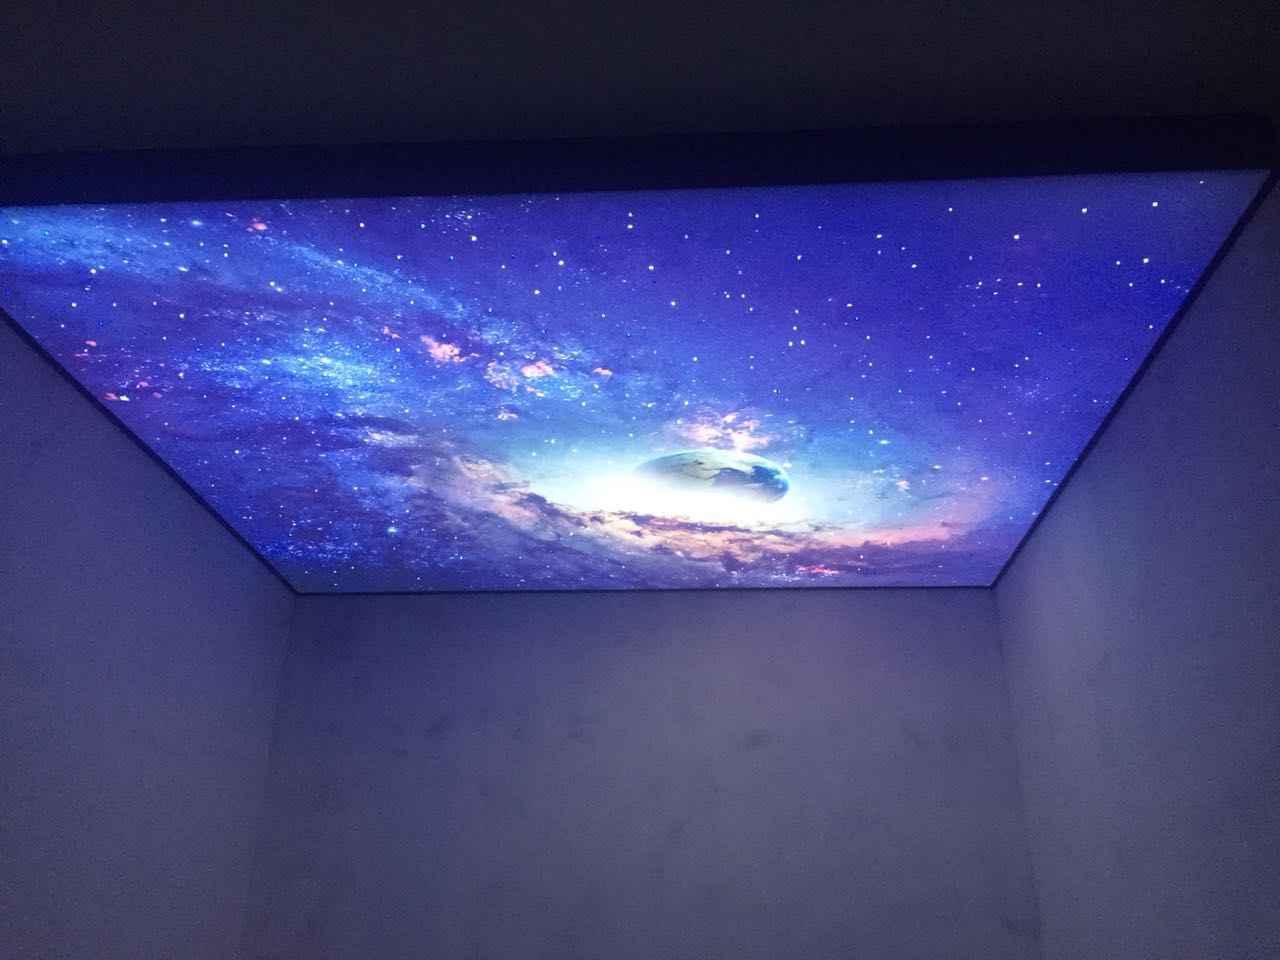 Потолок звездное небо #6